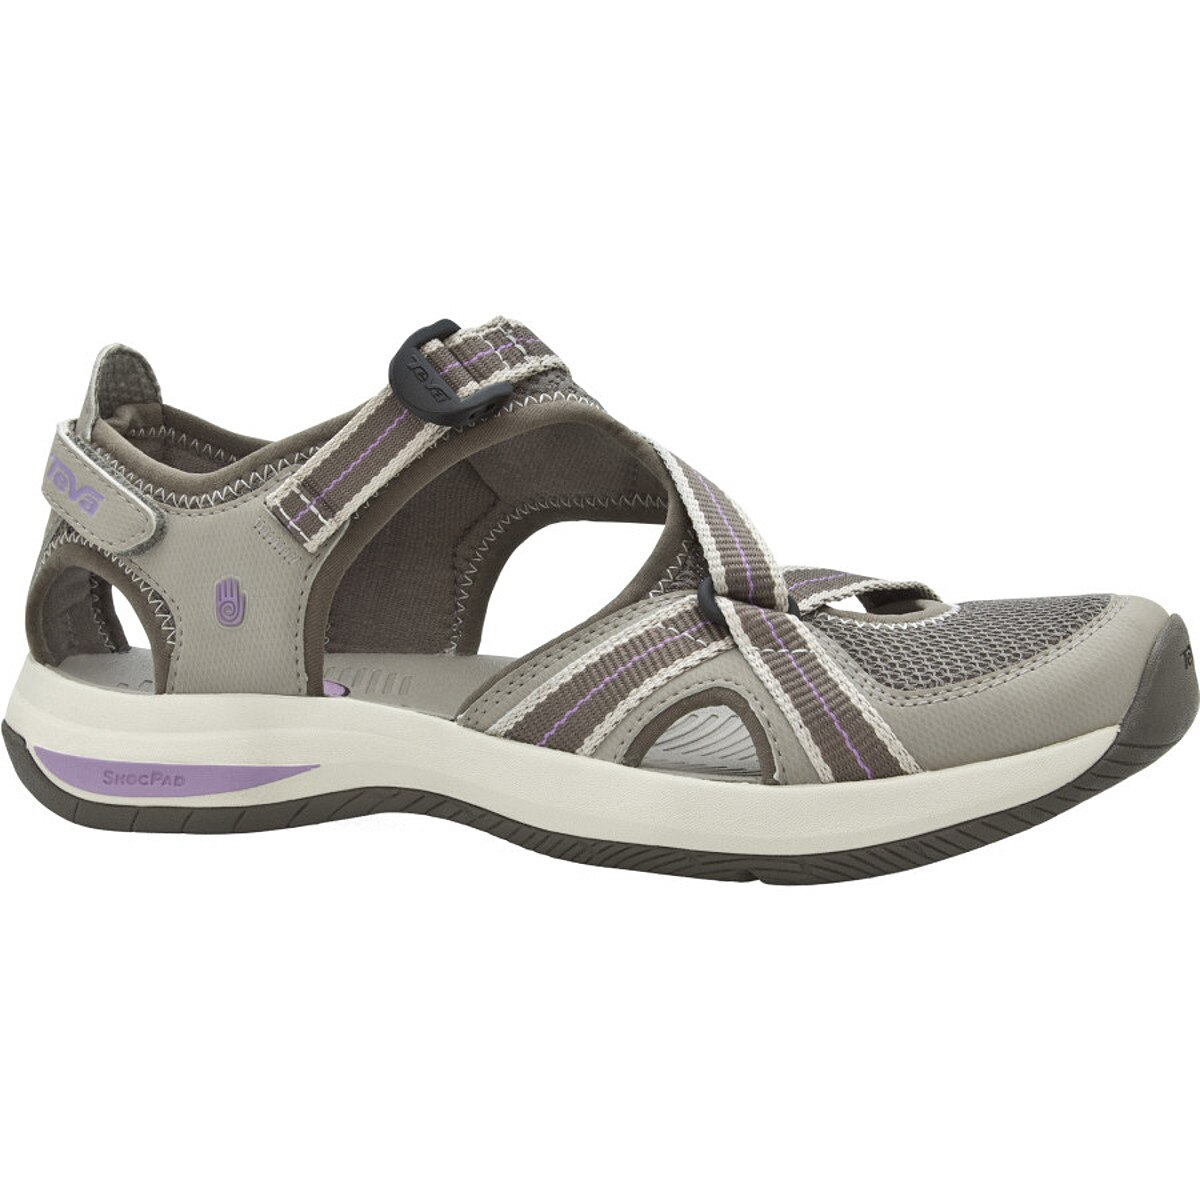 Teva Ewaso Sandals